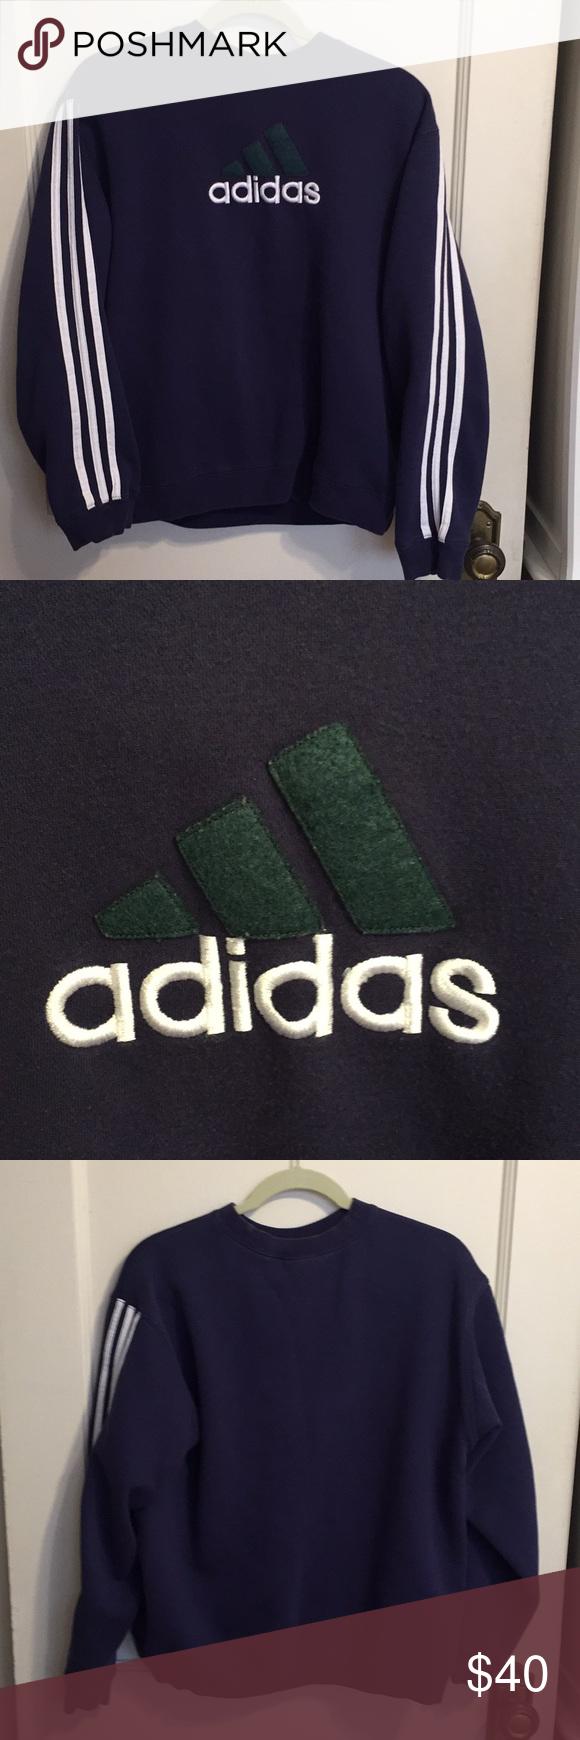 Vintage 1990s Adidas Sweatshirt Navy Blue Adidas Sweatshirt With White Three Stripes On The Arms And Three Stri Adidas Sweatshirt Vintage Shirts Adidas Shirt [ 1740 x 580 Pixel ]